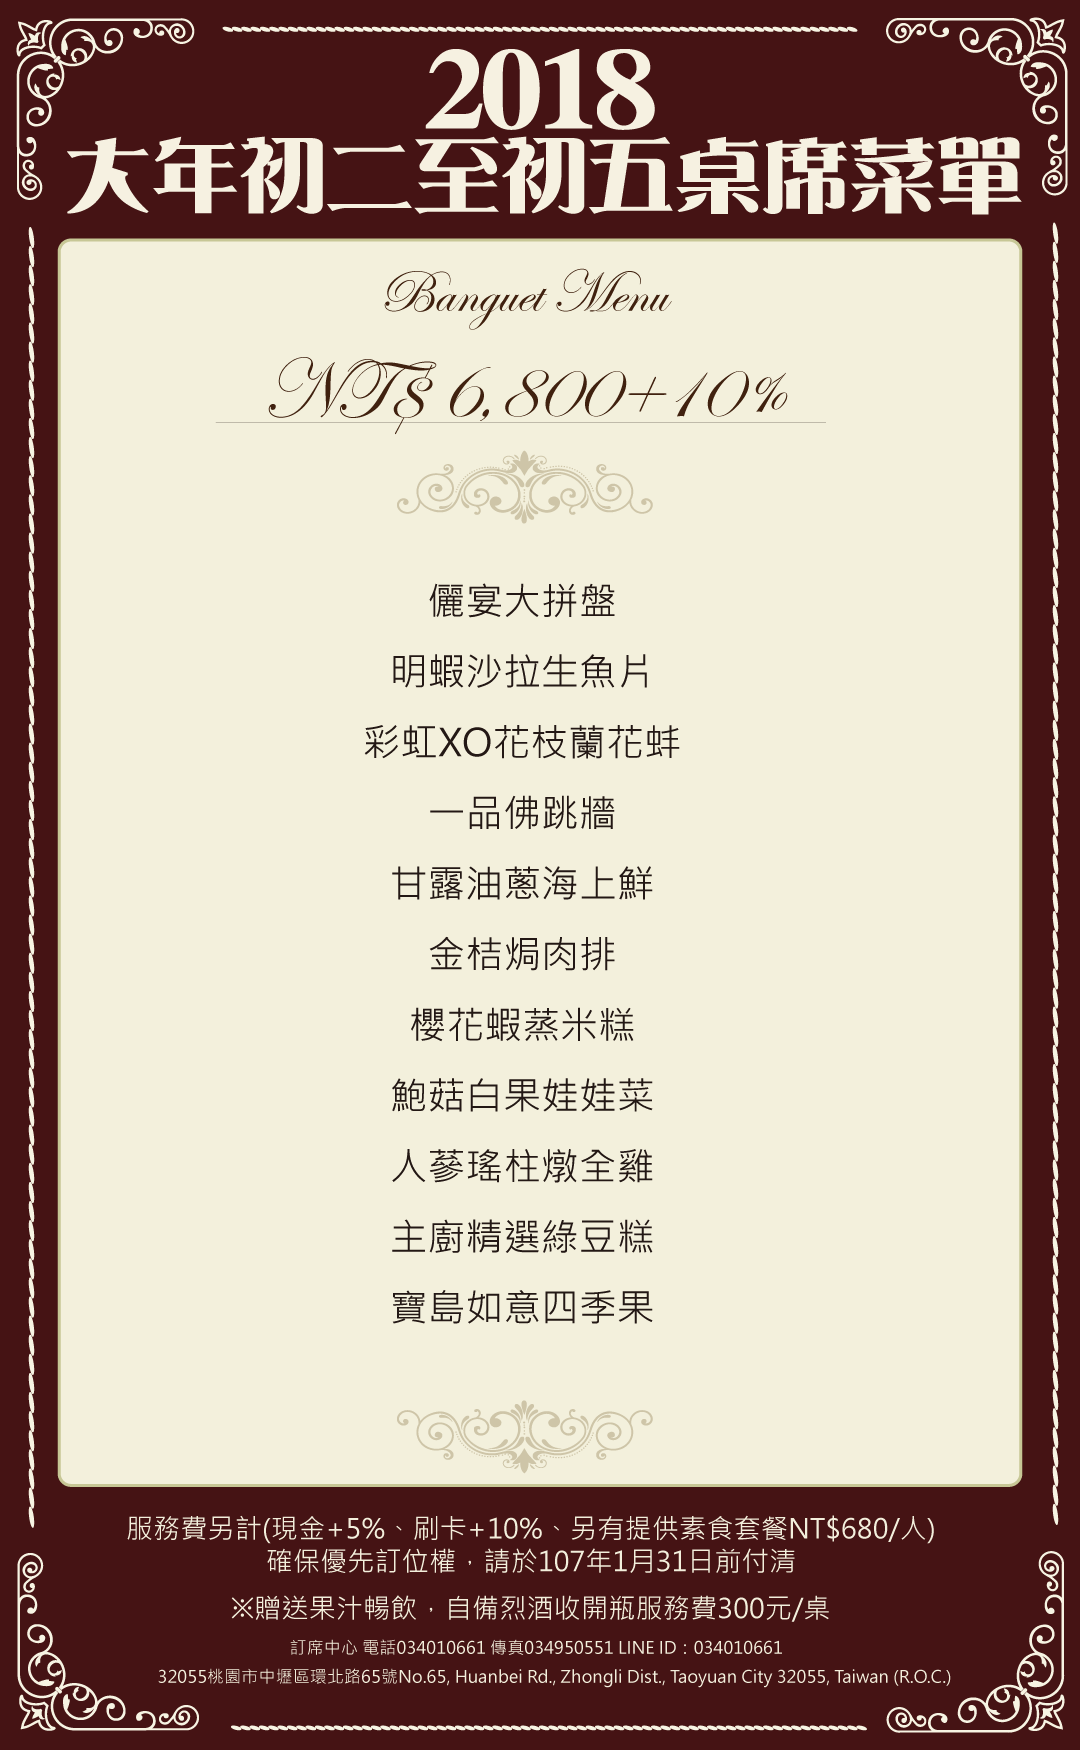 除夕菜單6800-01.png